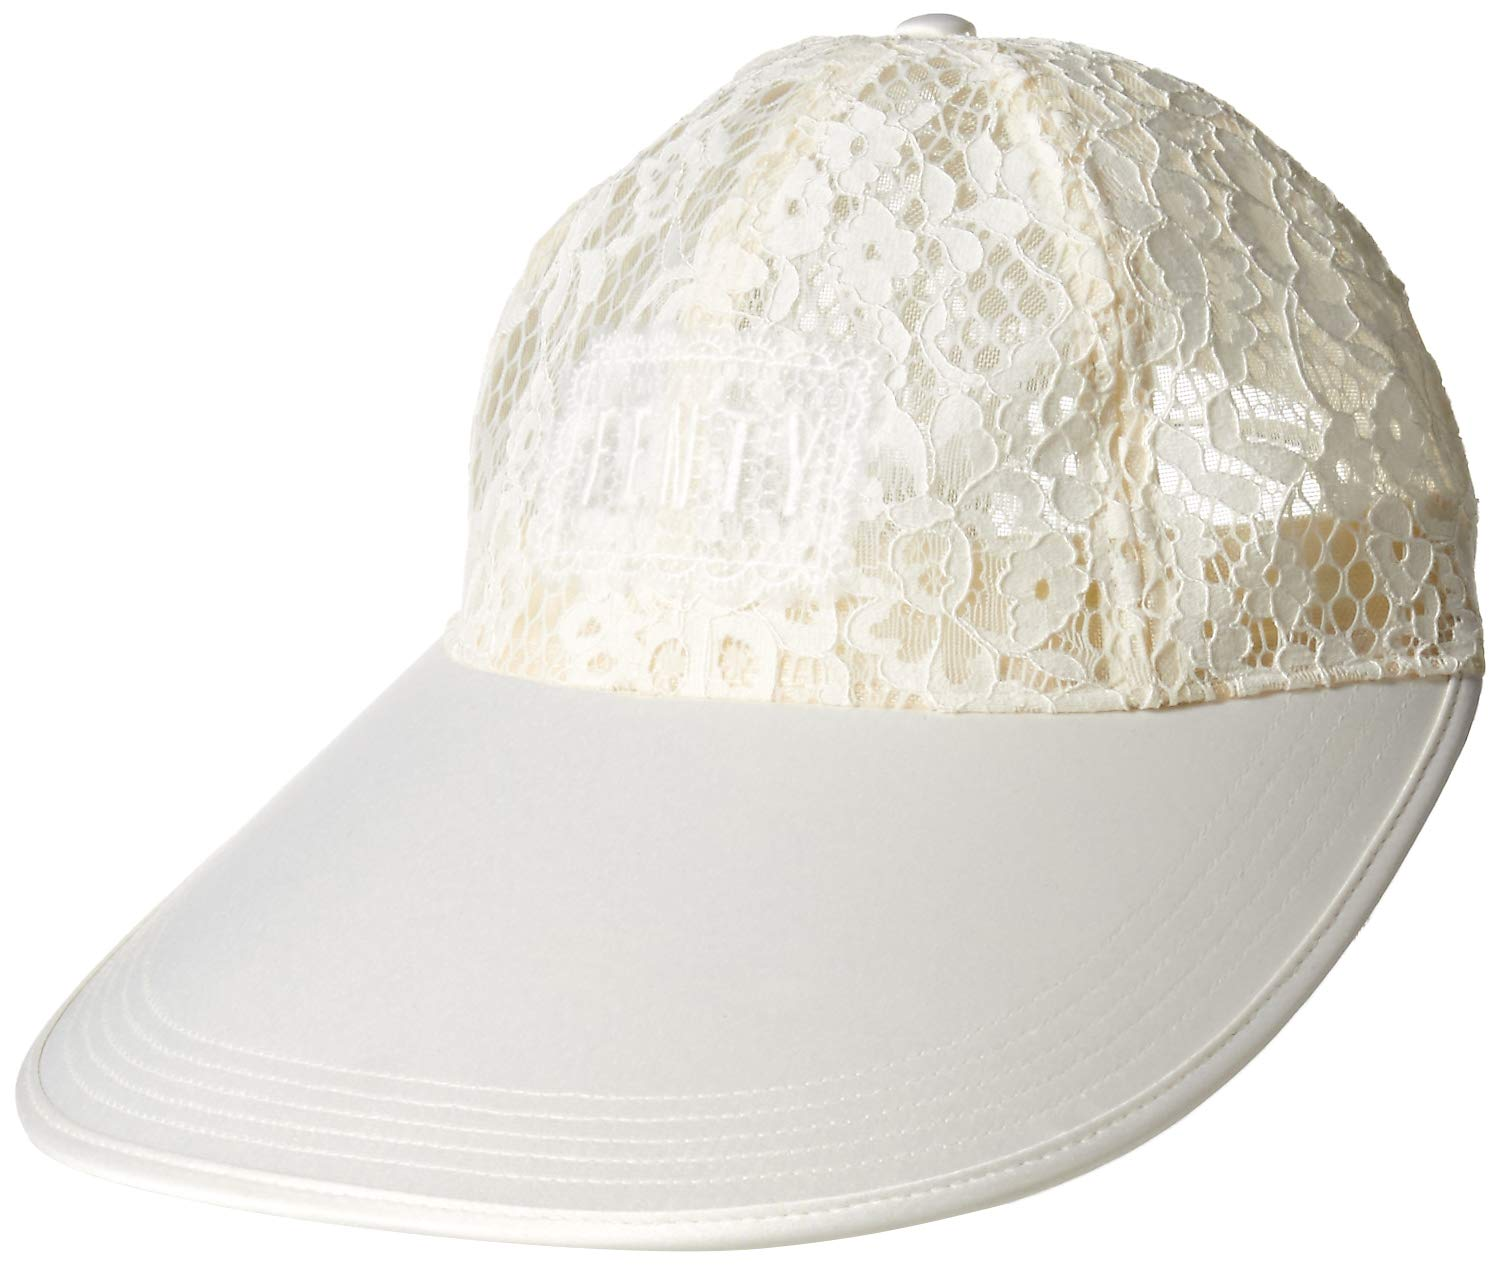 PUMA Women's Fenty Oversized Visor Cap, Vanilla ice, Adult